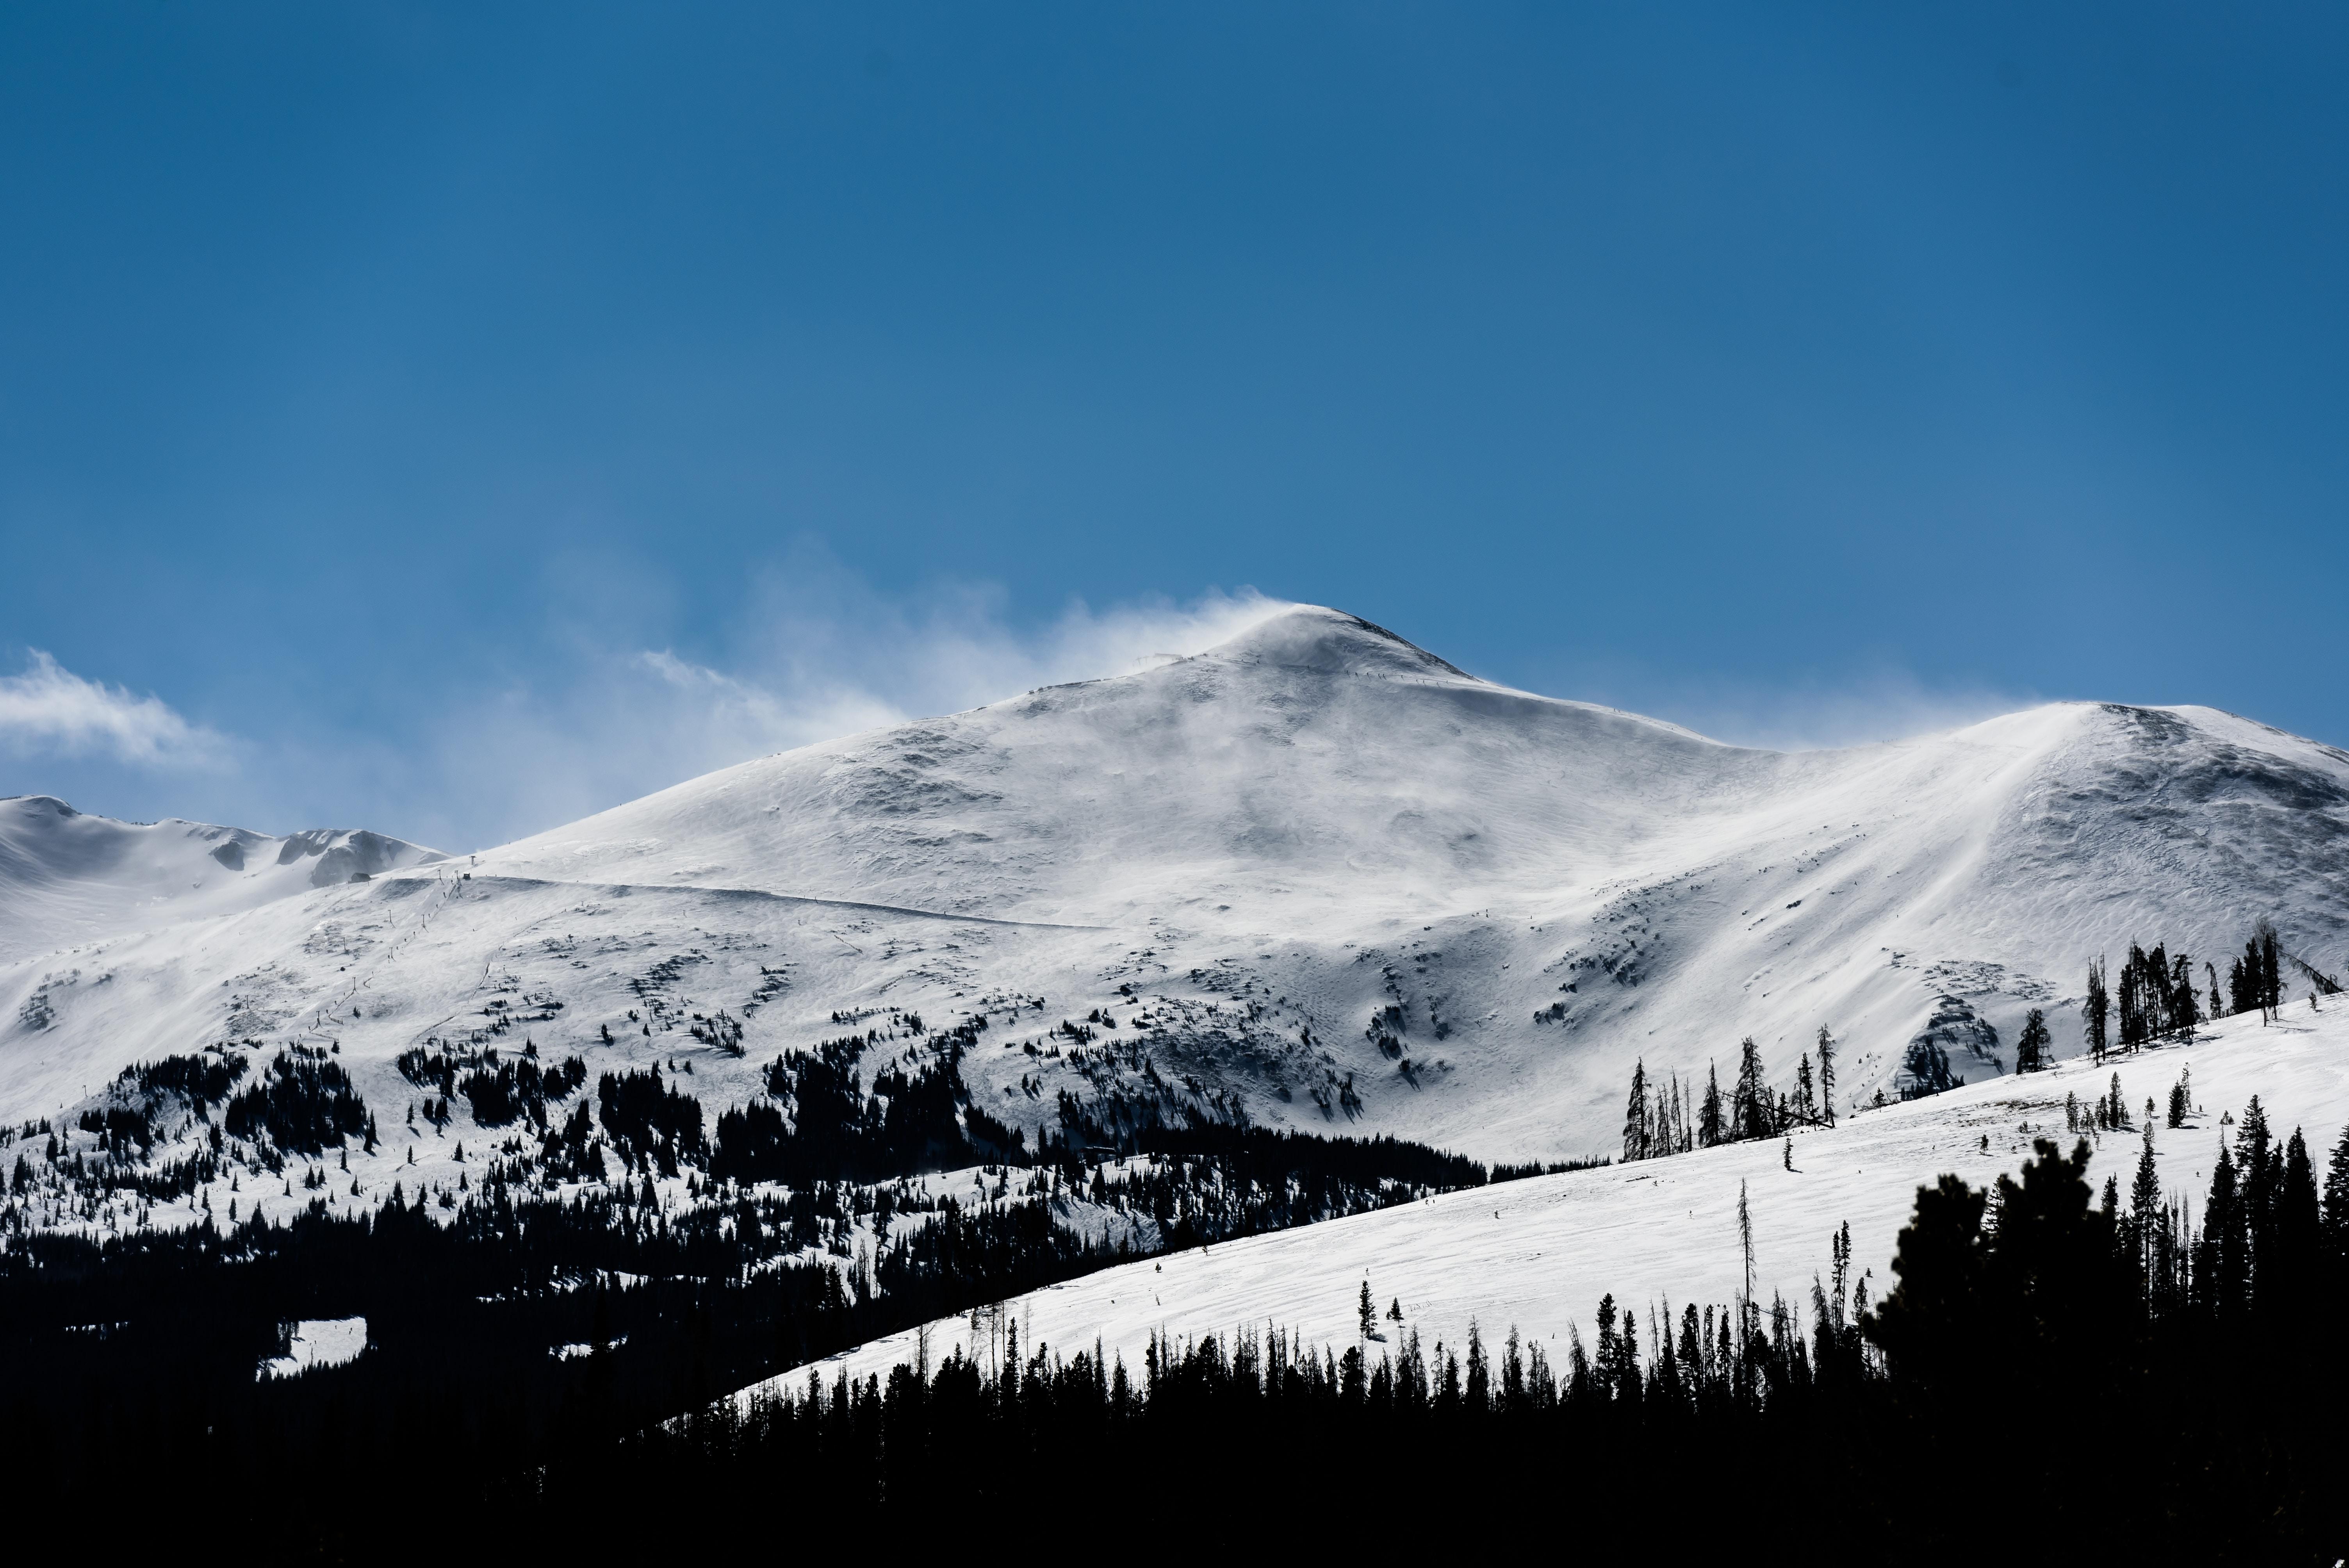 Wind blowing snow off a mountain ridge